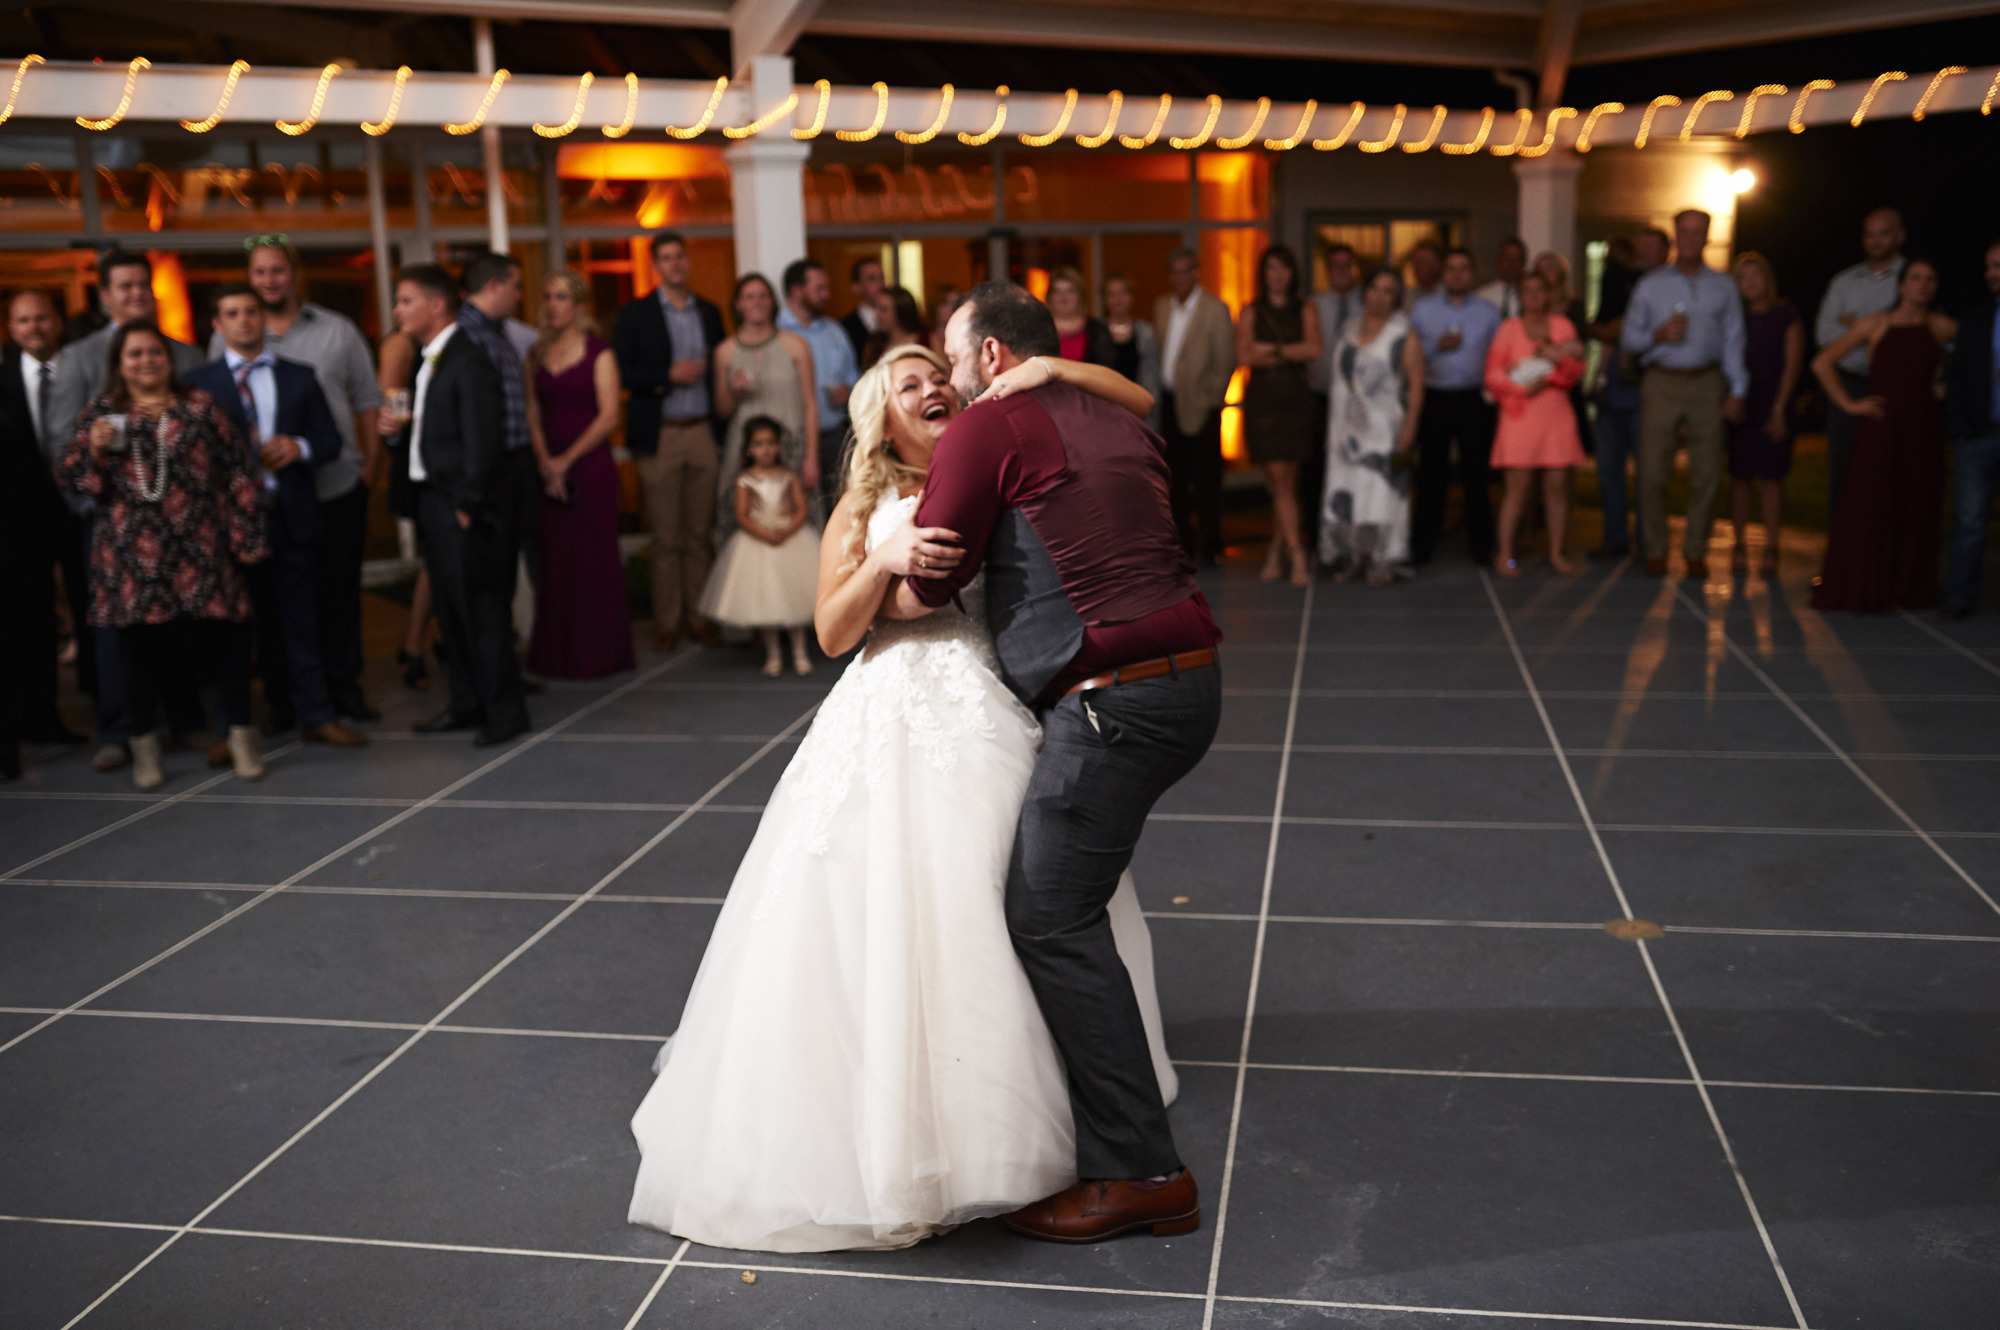 Taylor and Cody - Taylor Mansion and Crystal Ball Room - Taylor Texas - Wedding - 036